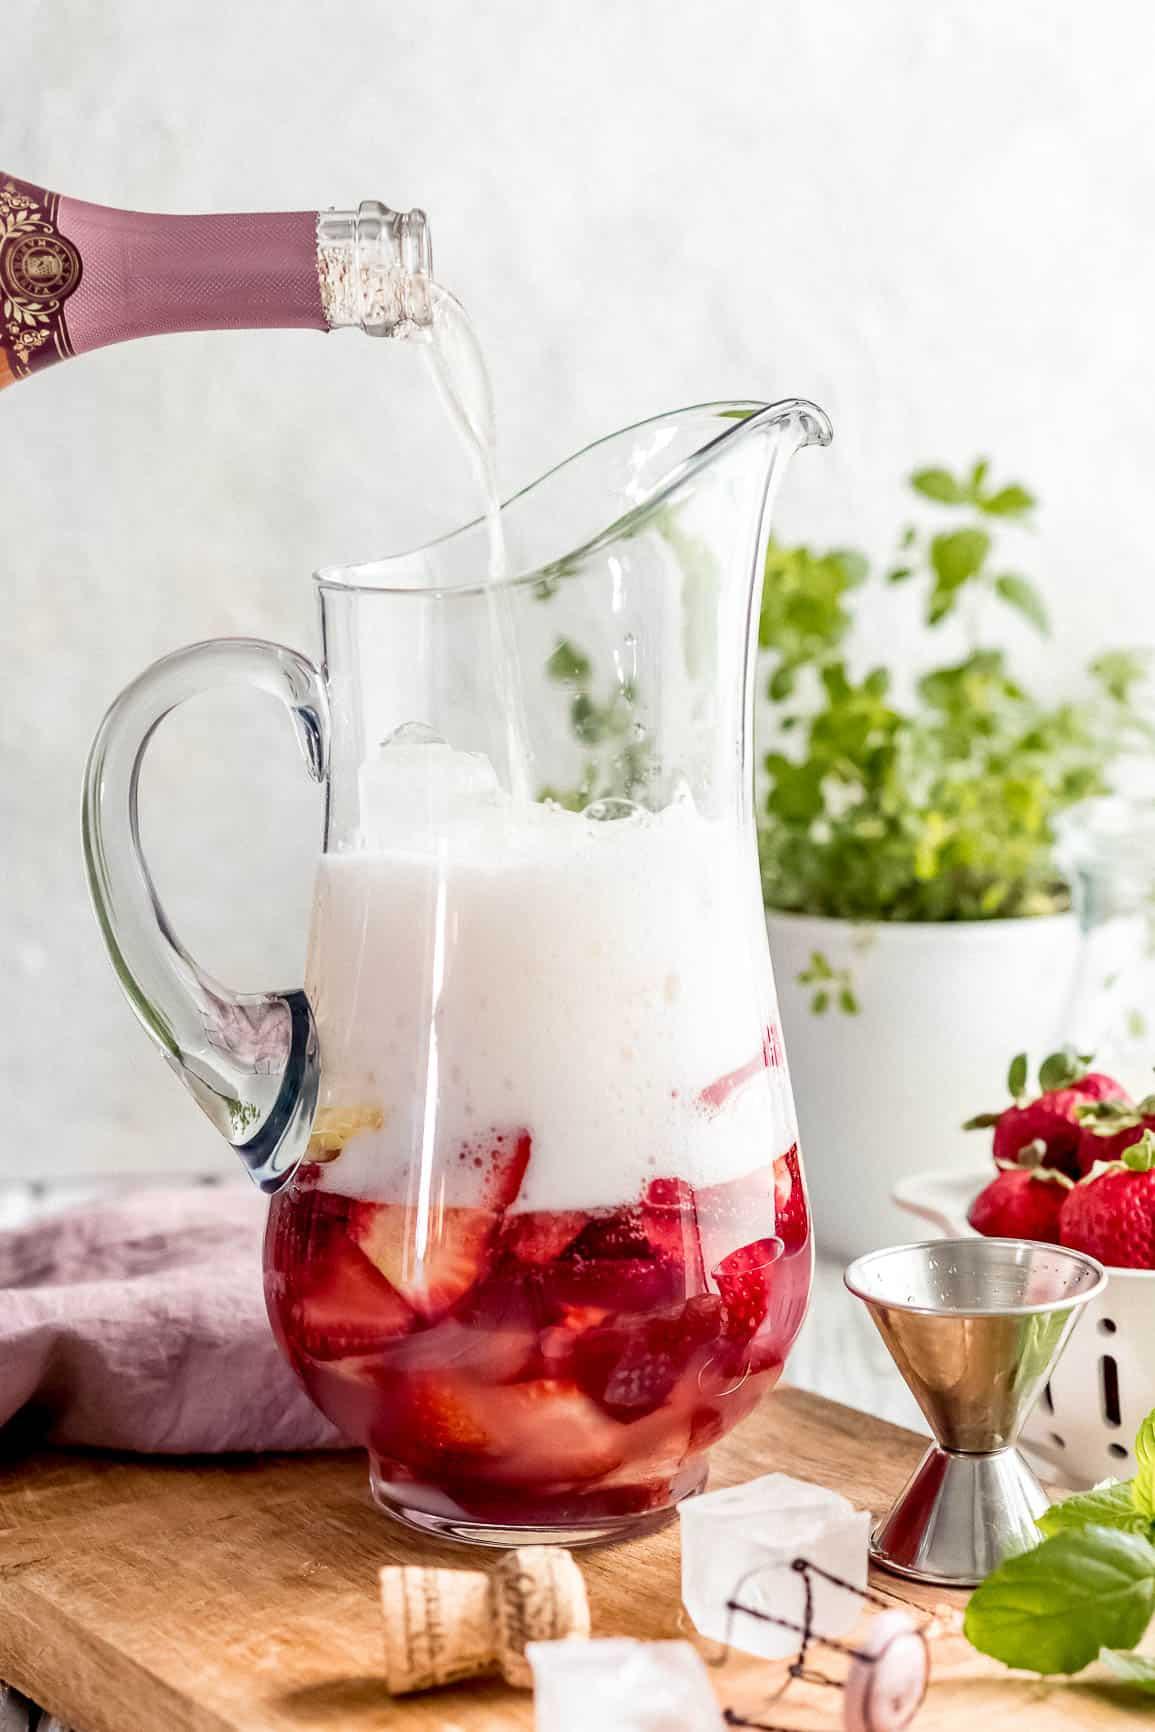 The Best Cocktail of Summer; Sparkling Strawberry Rosé Wine Sangria #ad #SipTheSummer #UncorkExtraordinary #SantaMargheritaWine